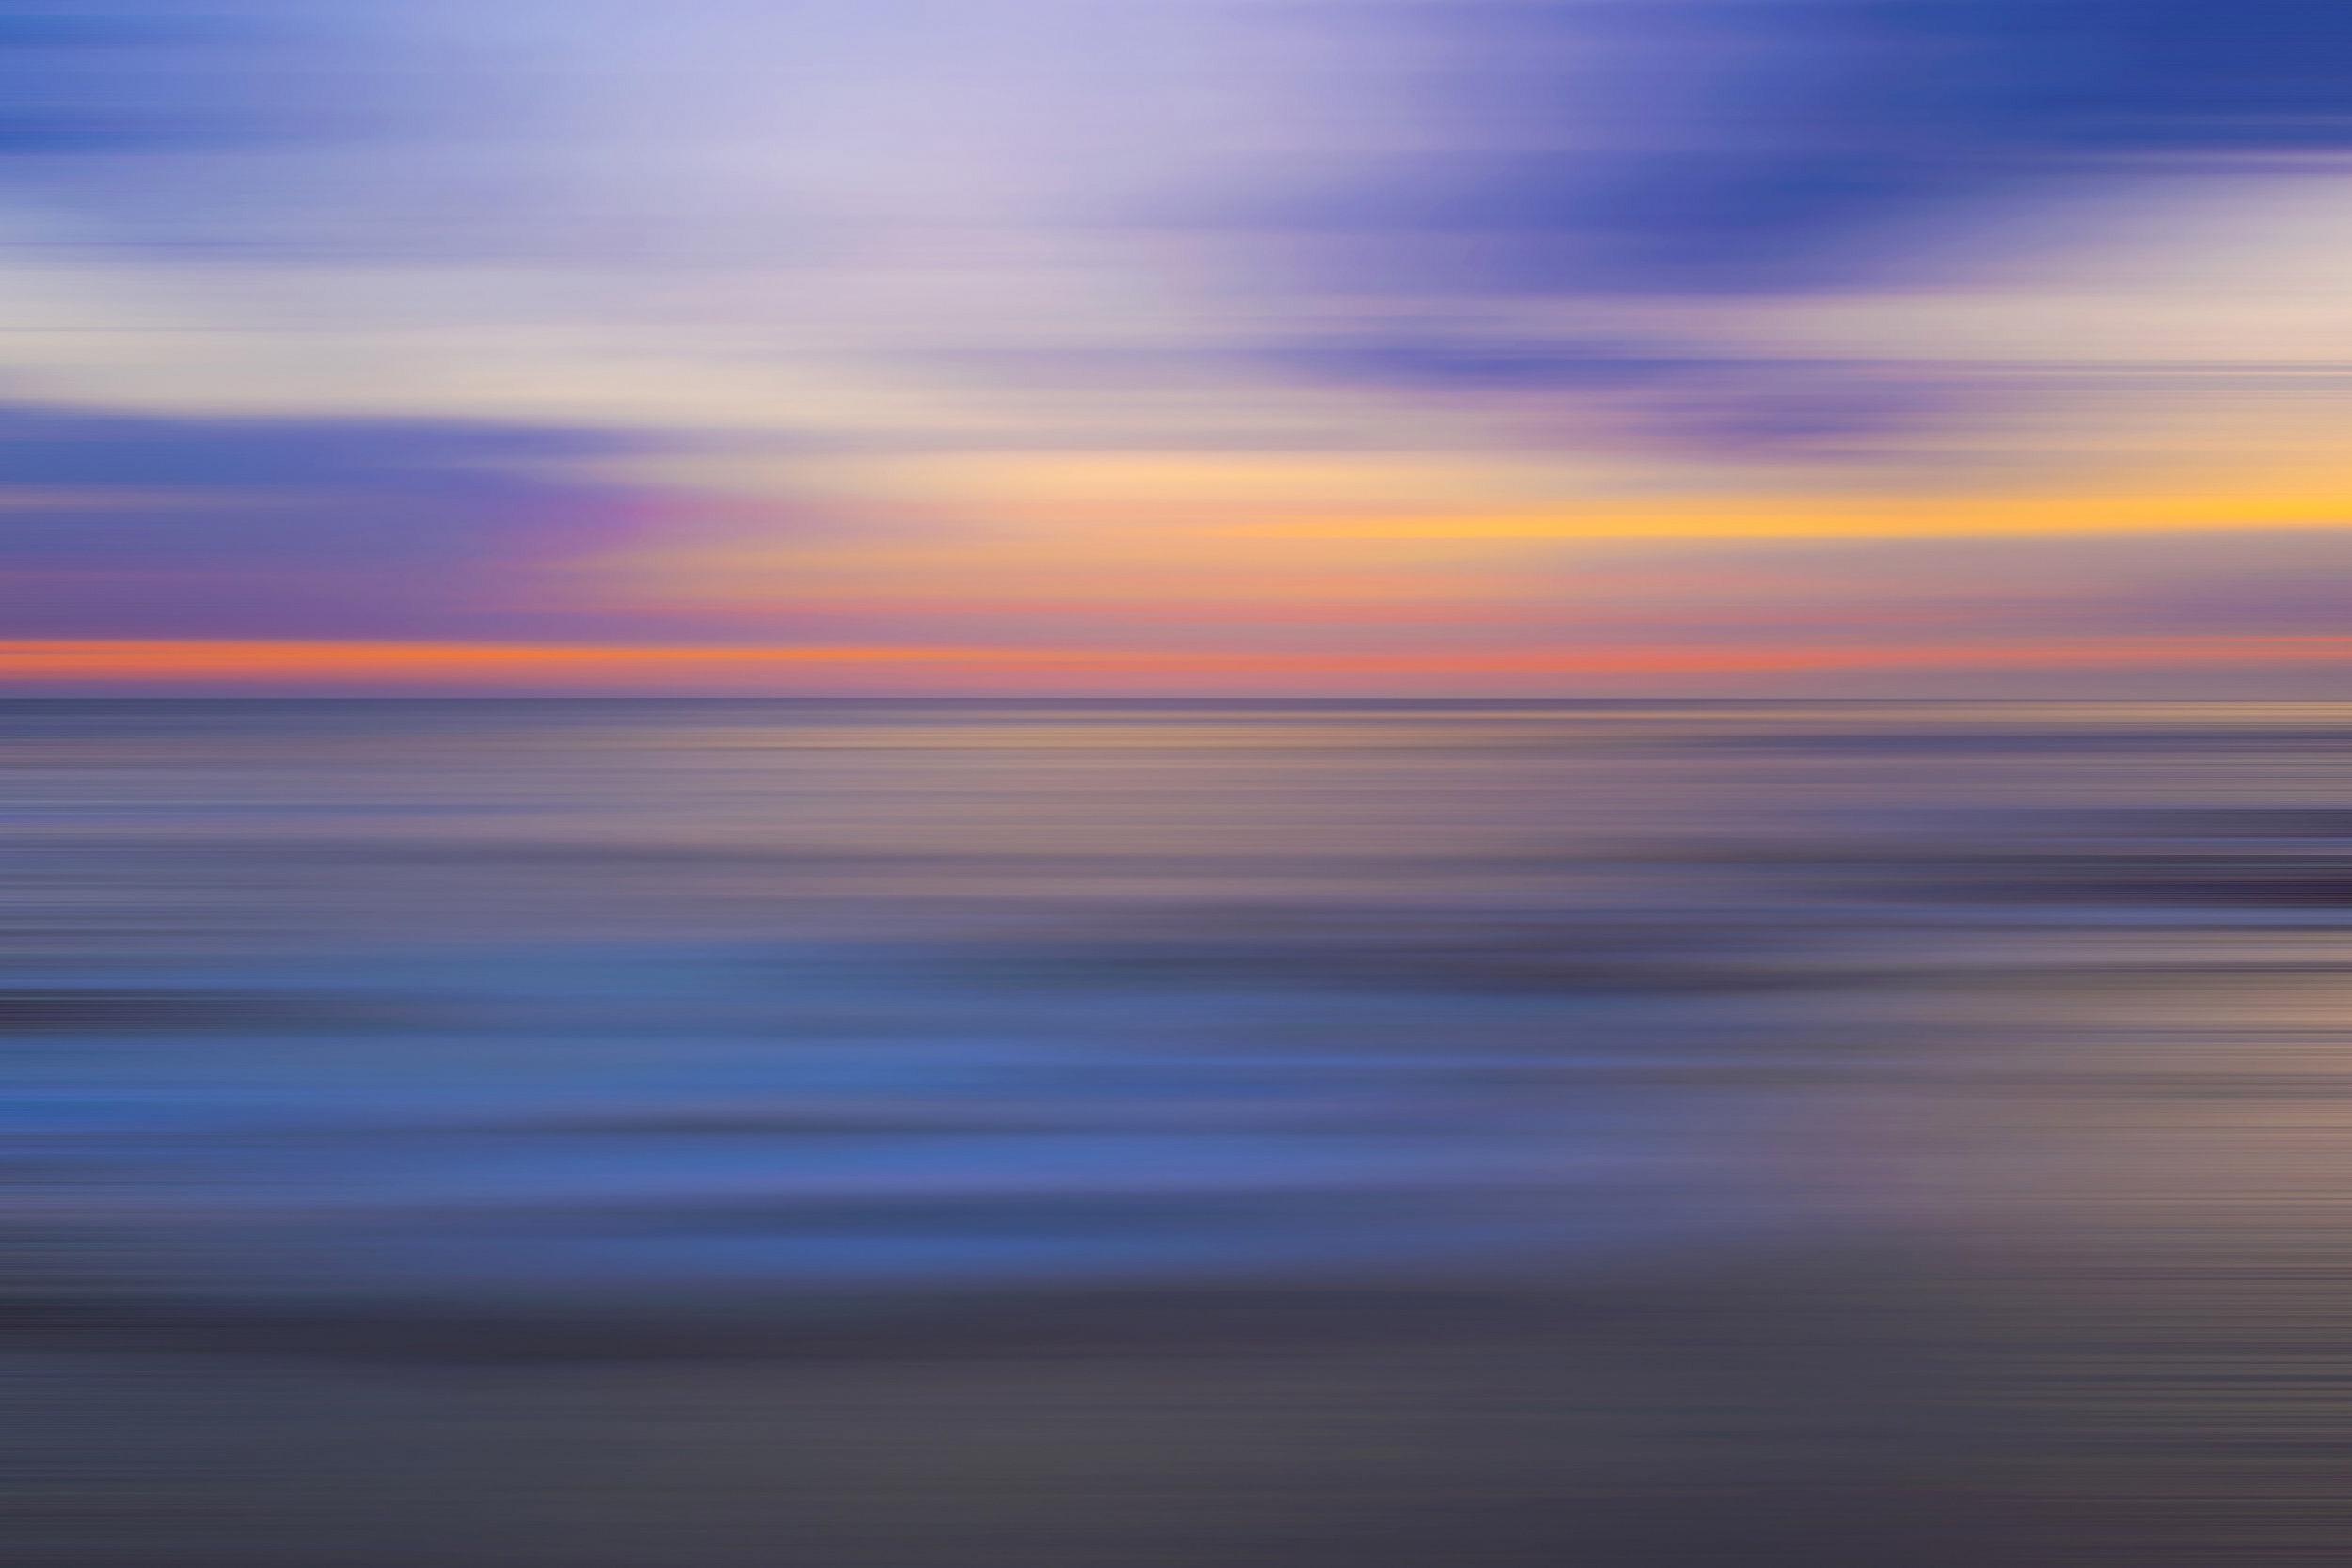 BlurSunset.jpg